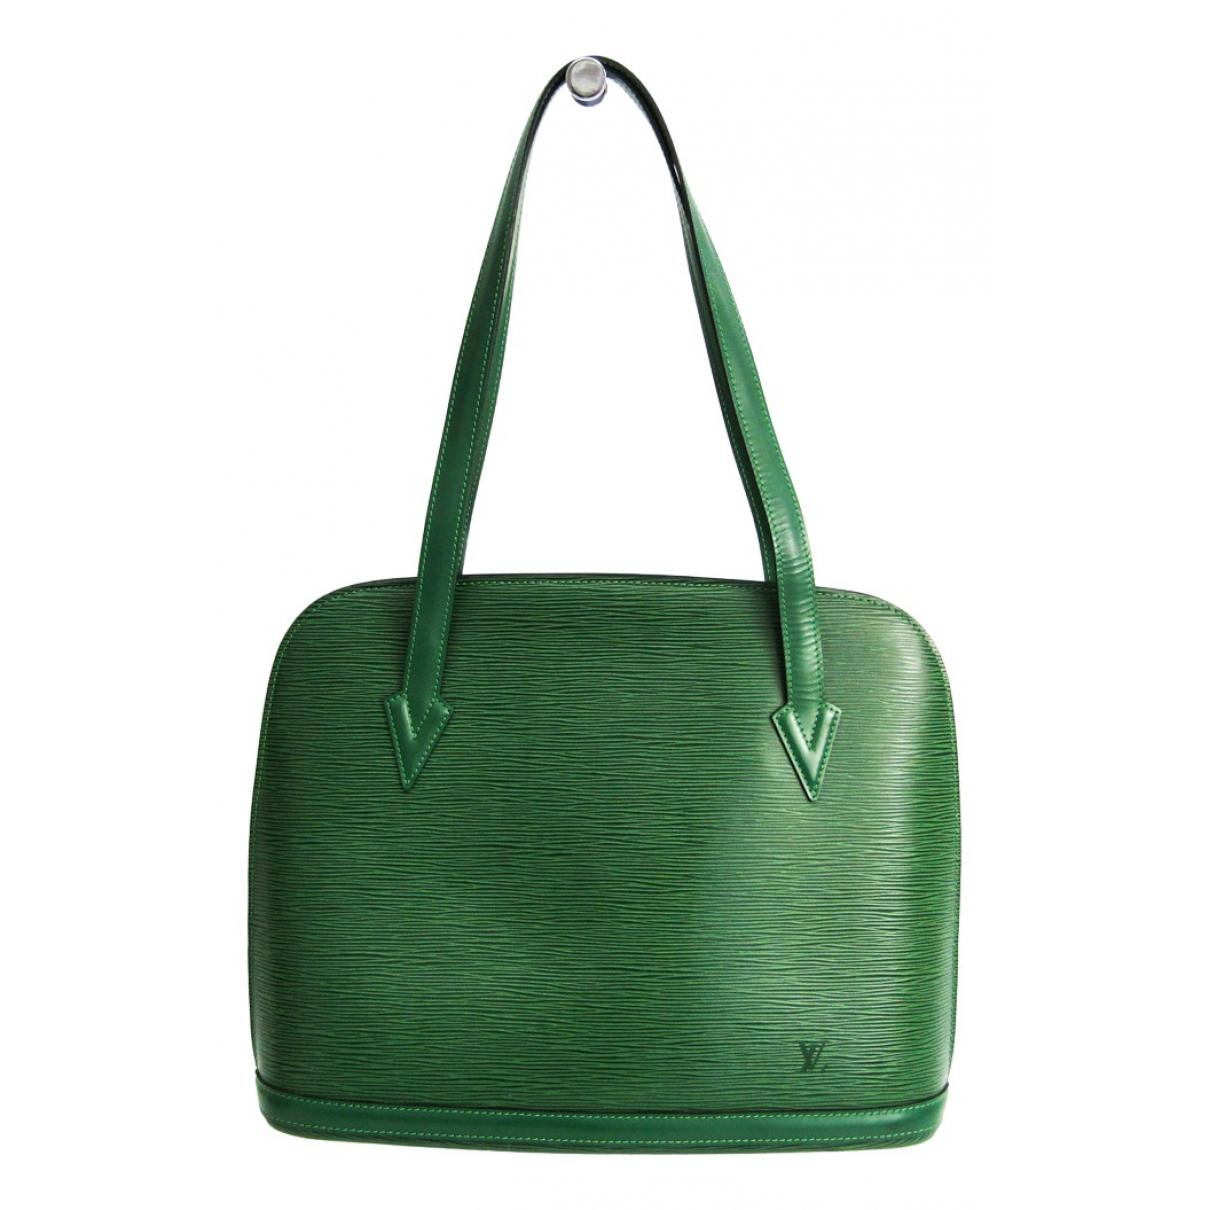 Louis Vuitton - Sac a main Lussac pour femme en cuir - vert